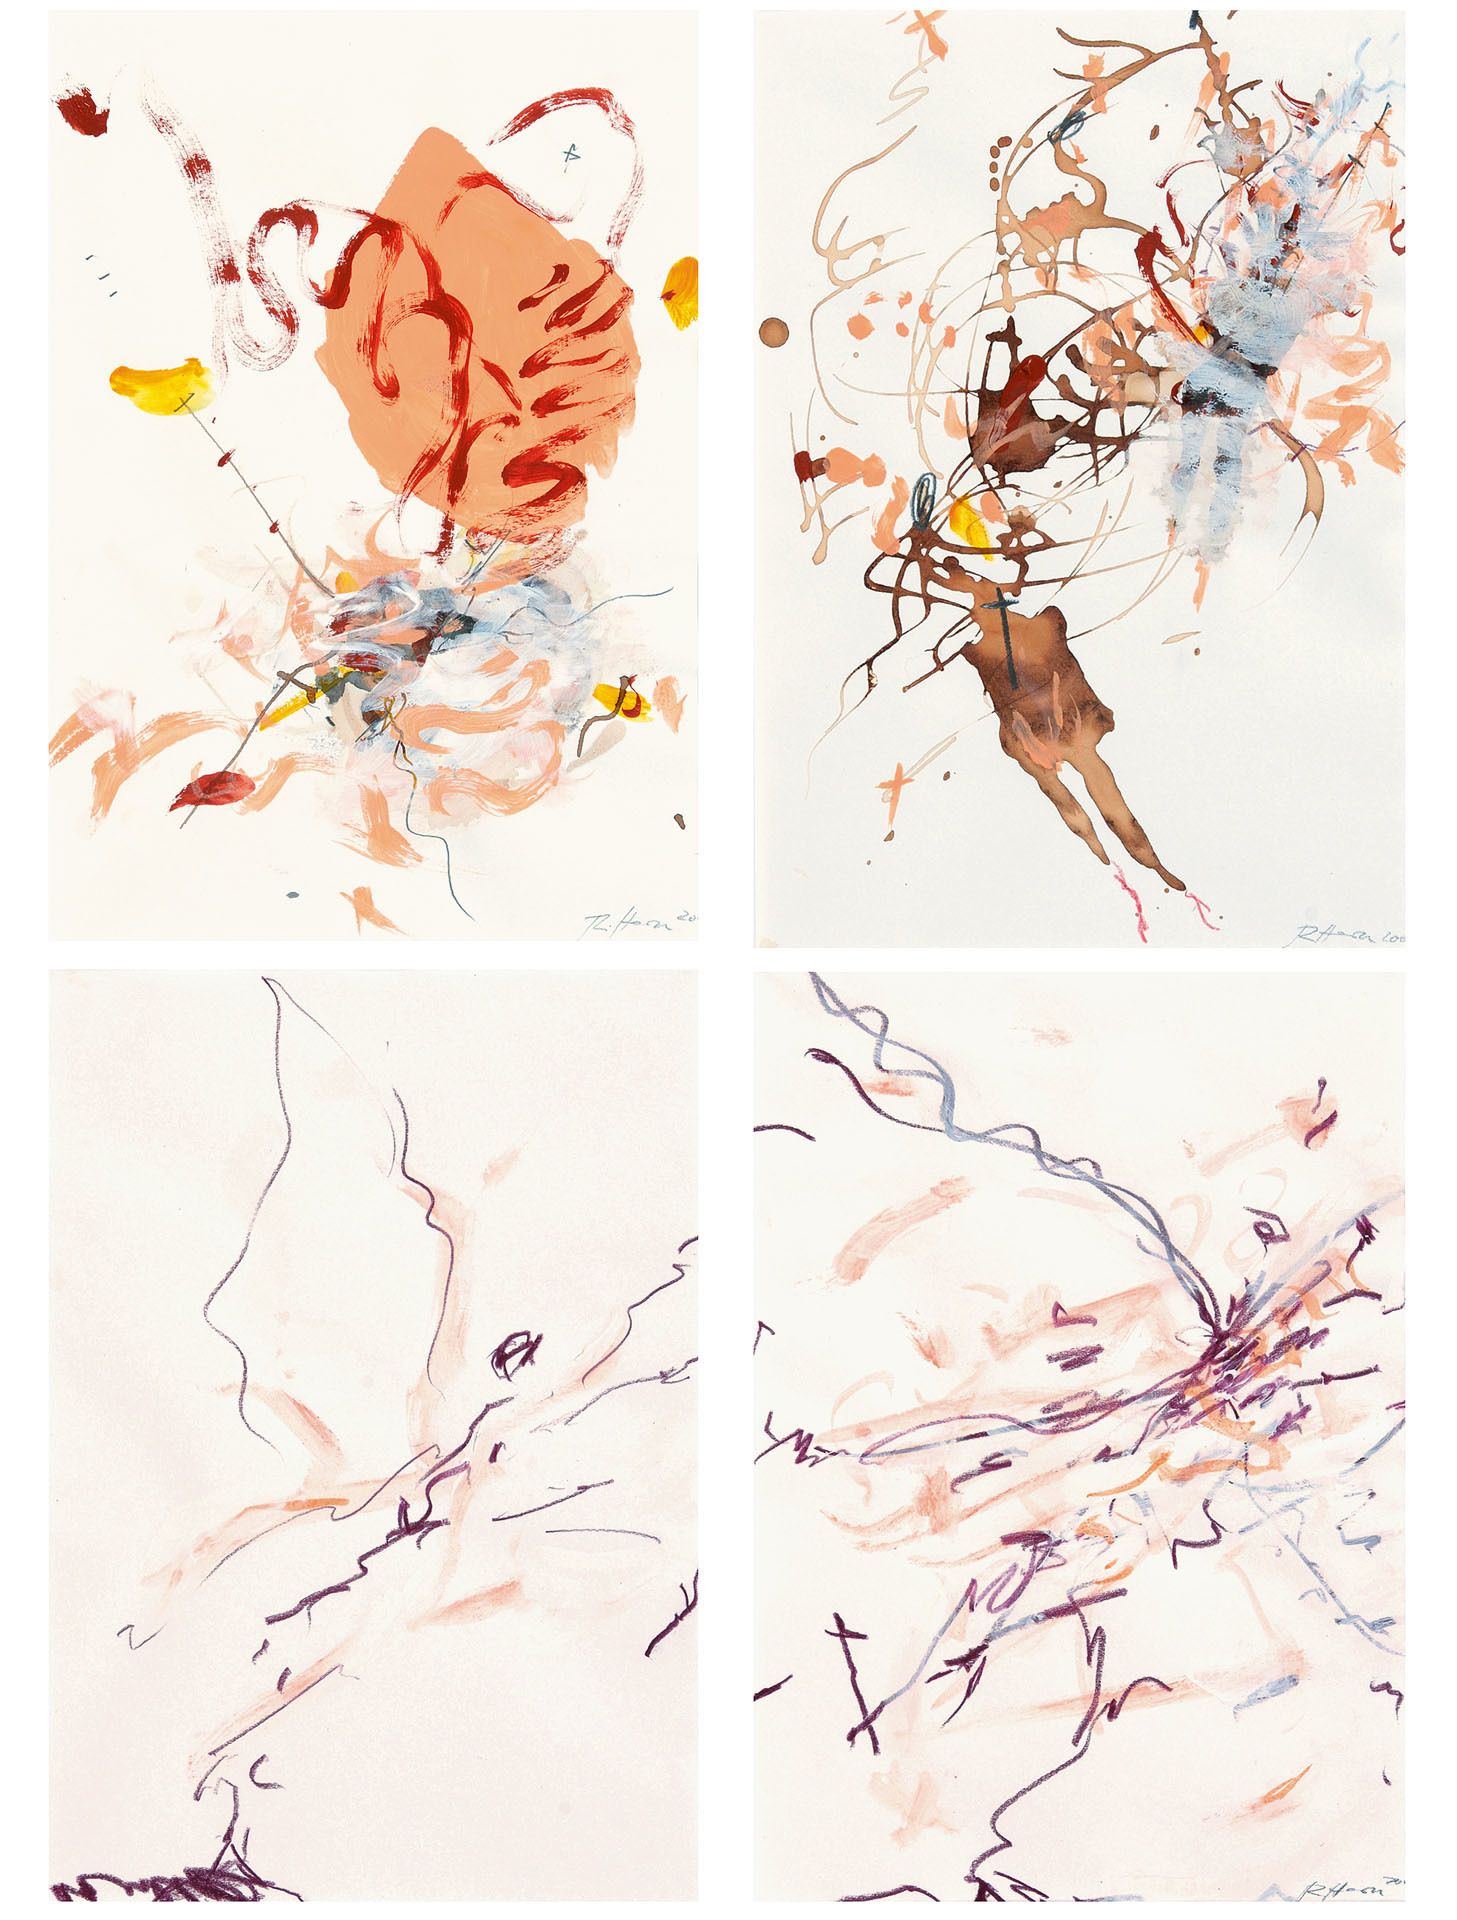 Horn Rebecca, 4 sheets: Engel 1; Engel 2; Untitled (2)